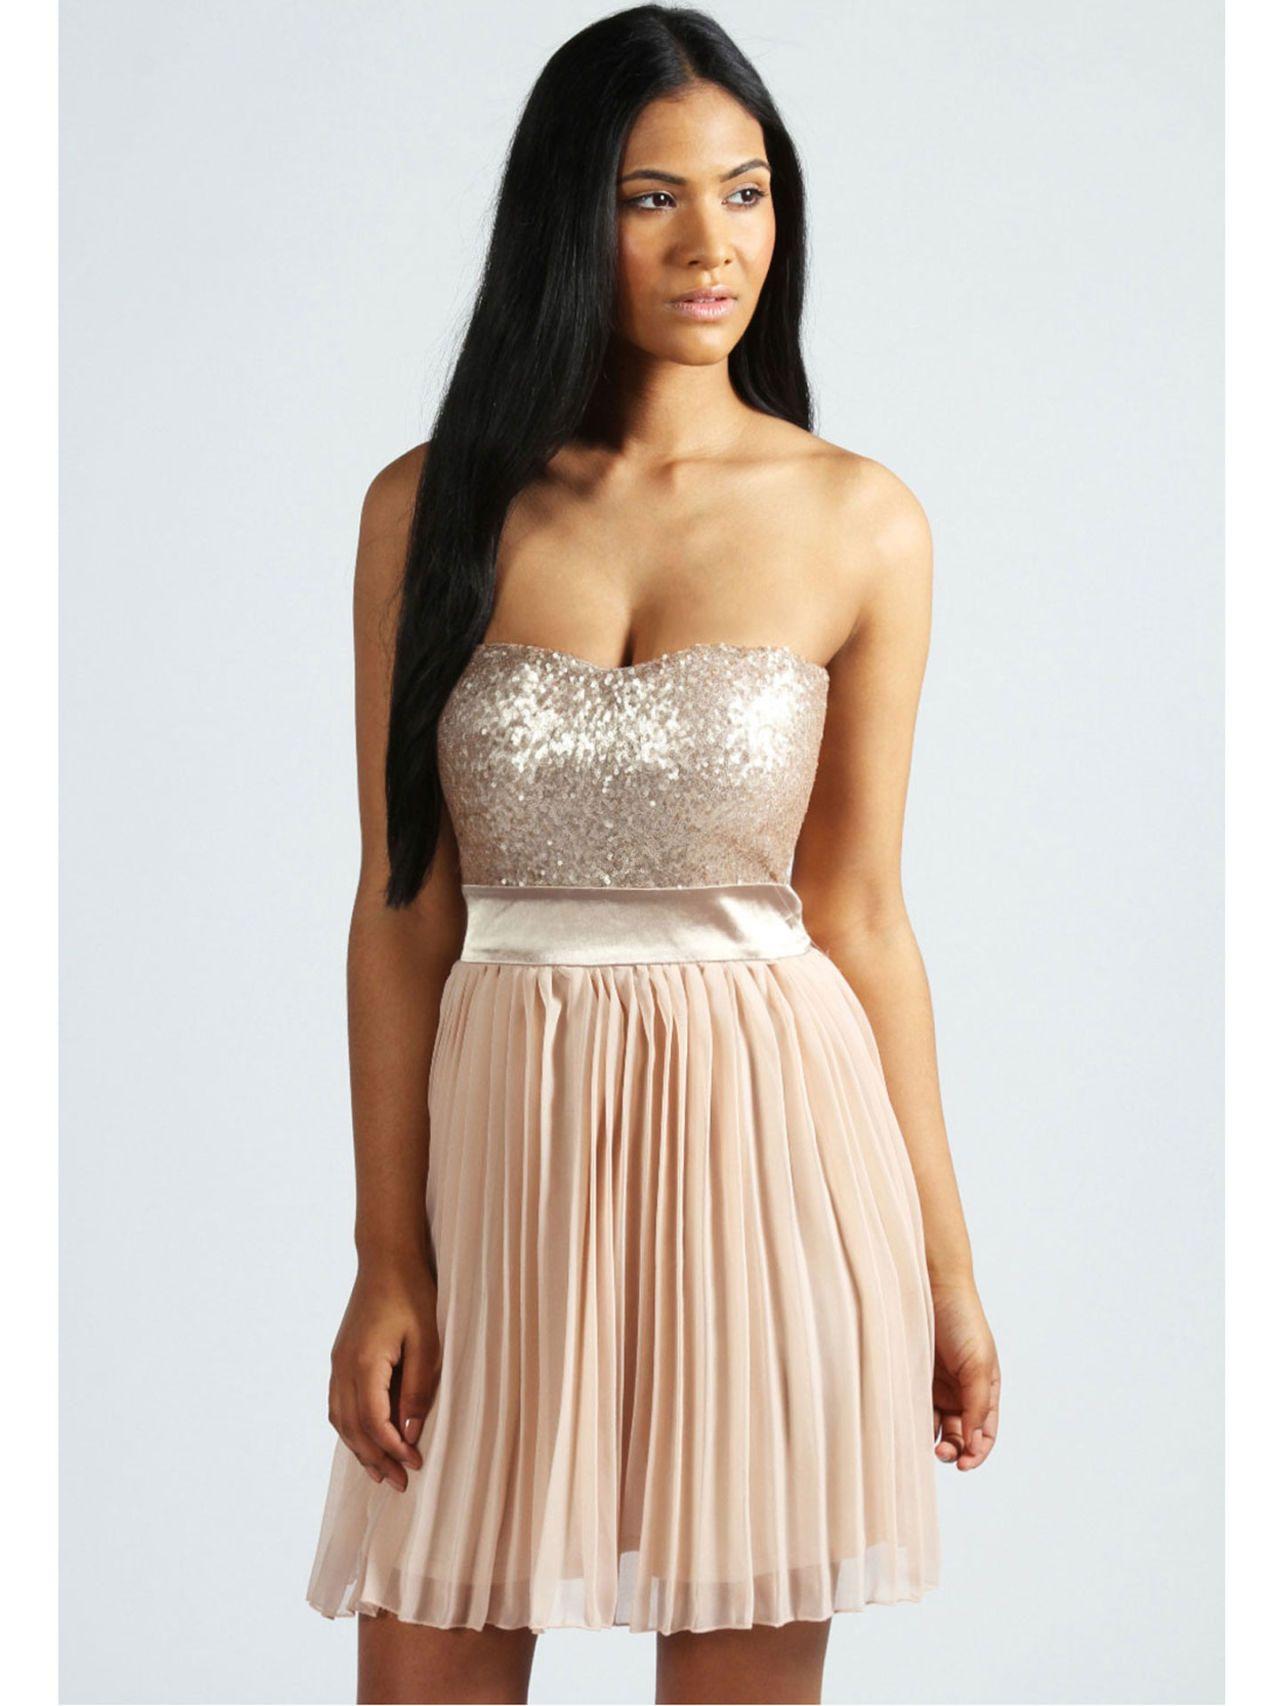 bebdc62d7e Cheap Damas Dresses - Damas Dresses Under 100